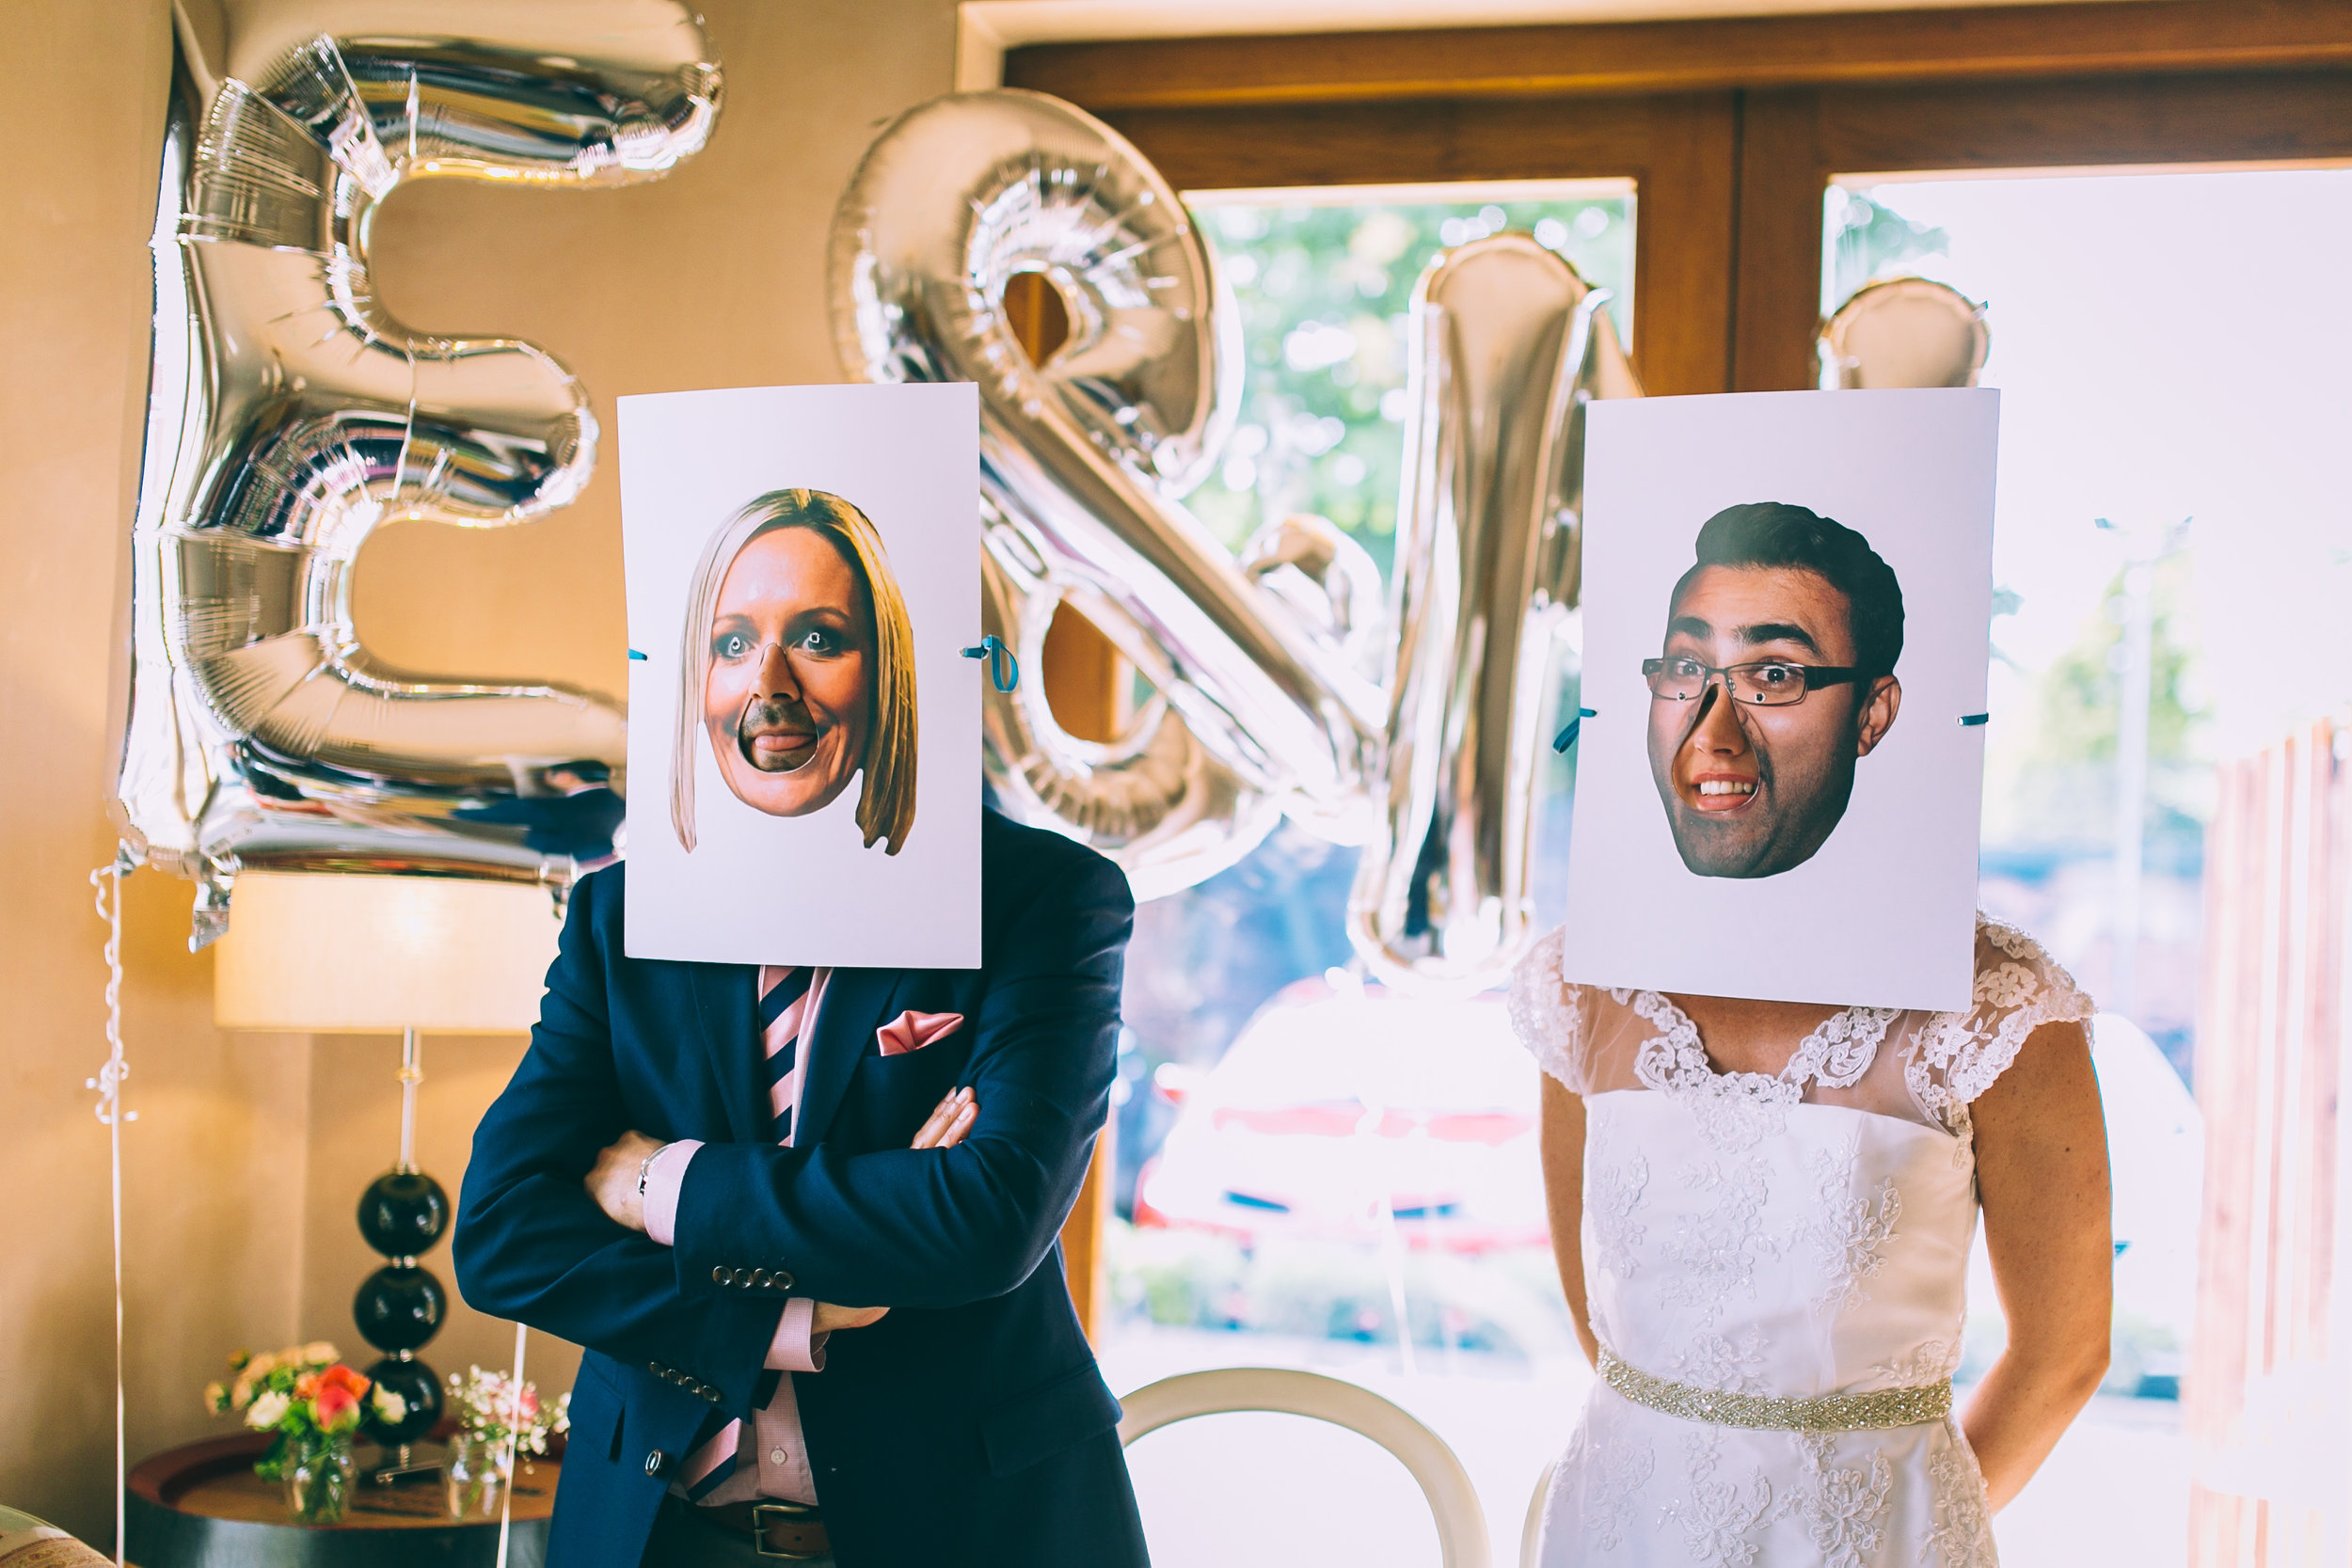 Nish&Emma-DAYFOUR-Wedding-in-pointing-dog-cheadle-tom-biddle-photography-tb147.jpg